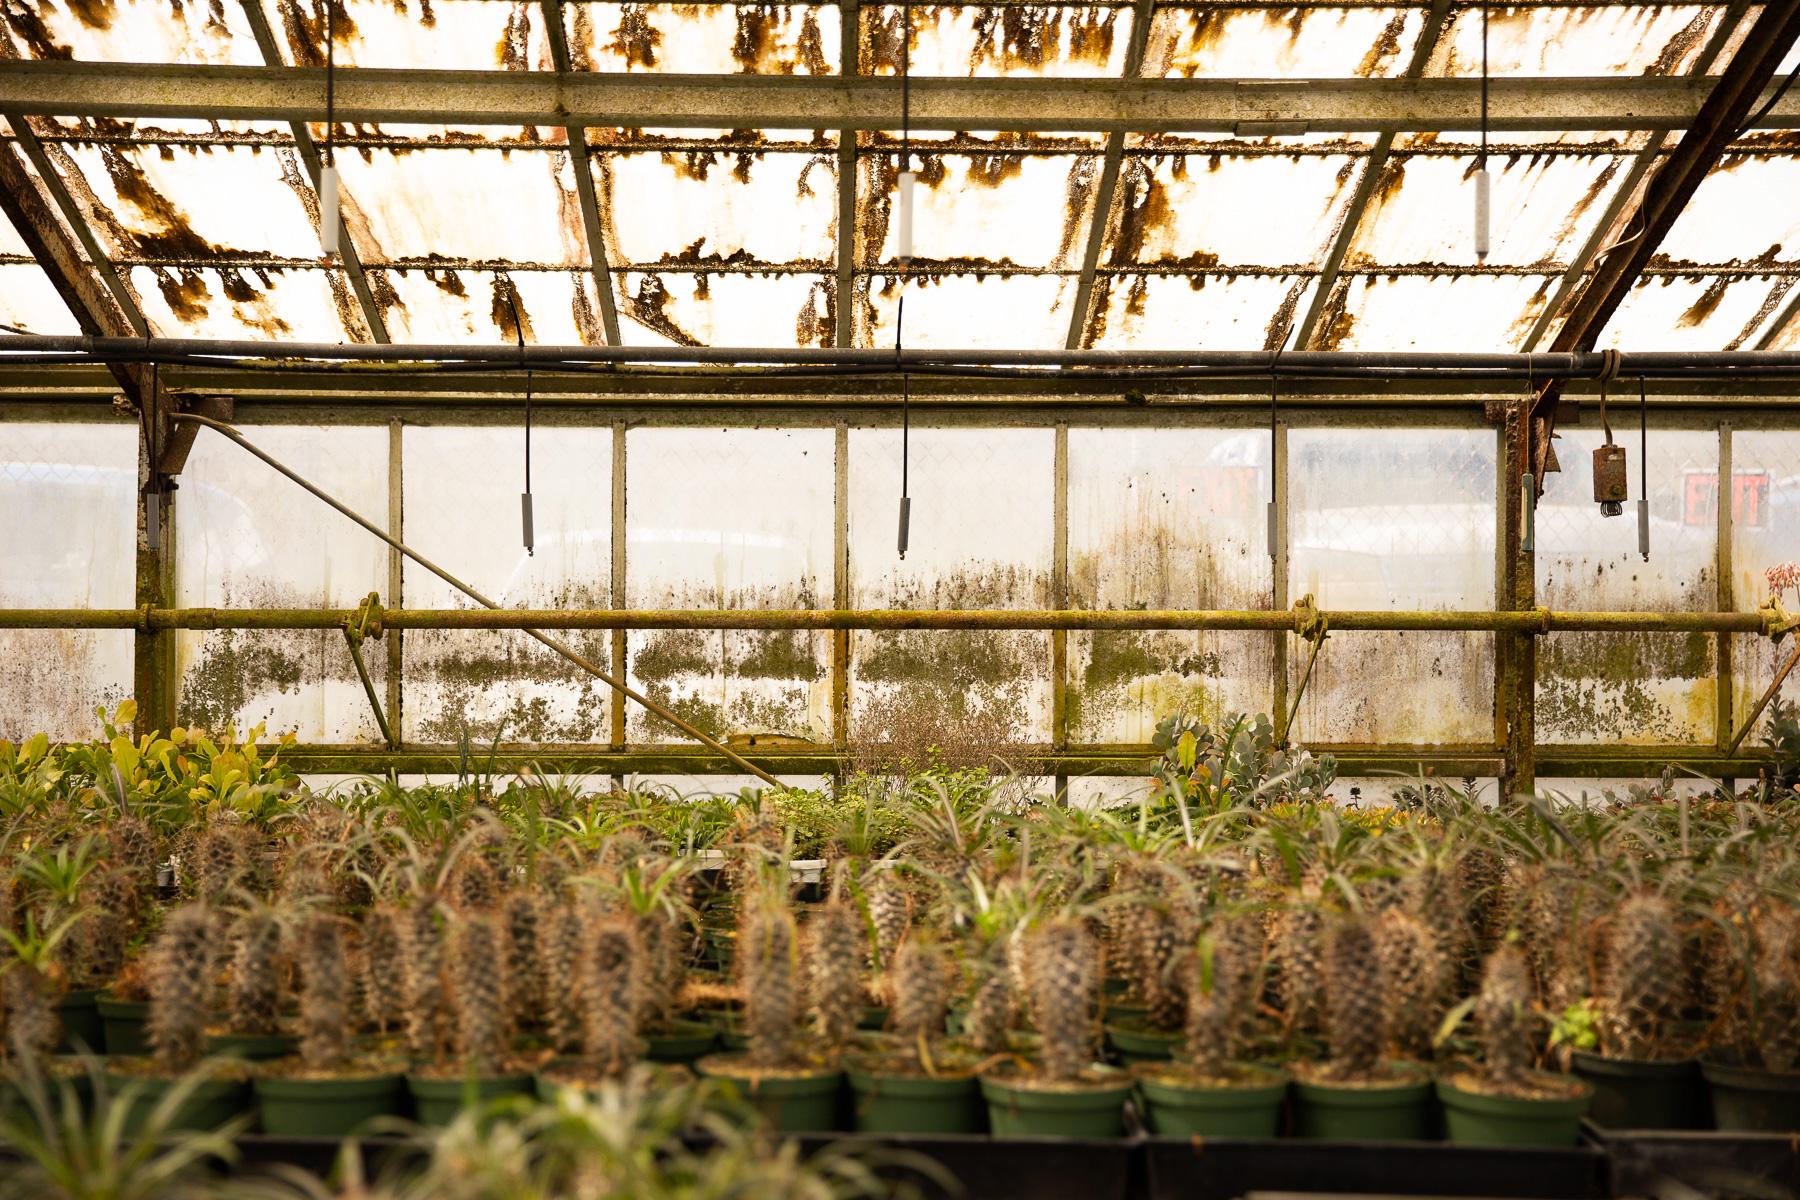 floridacactus (4 of 5).jpg